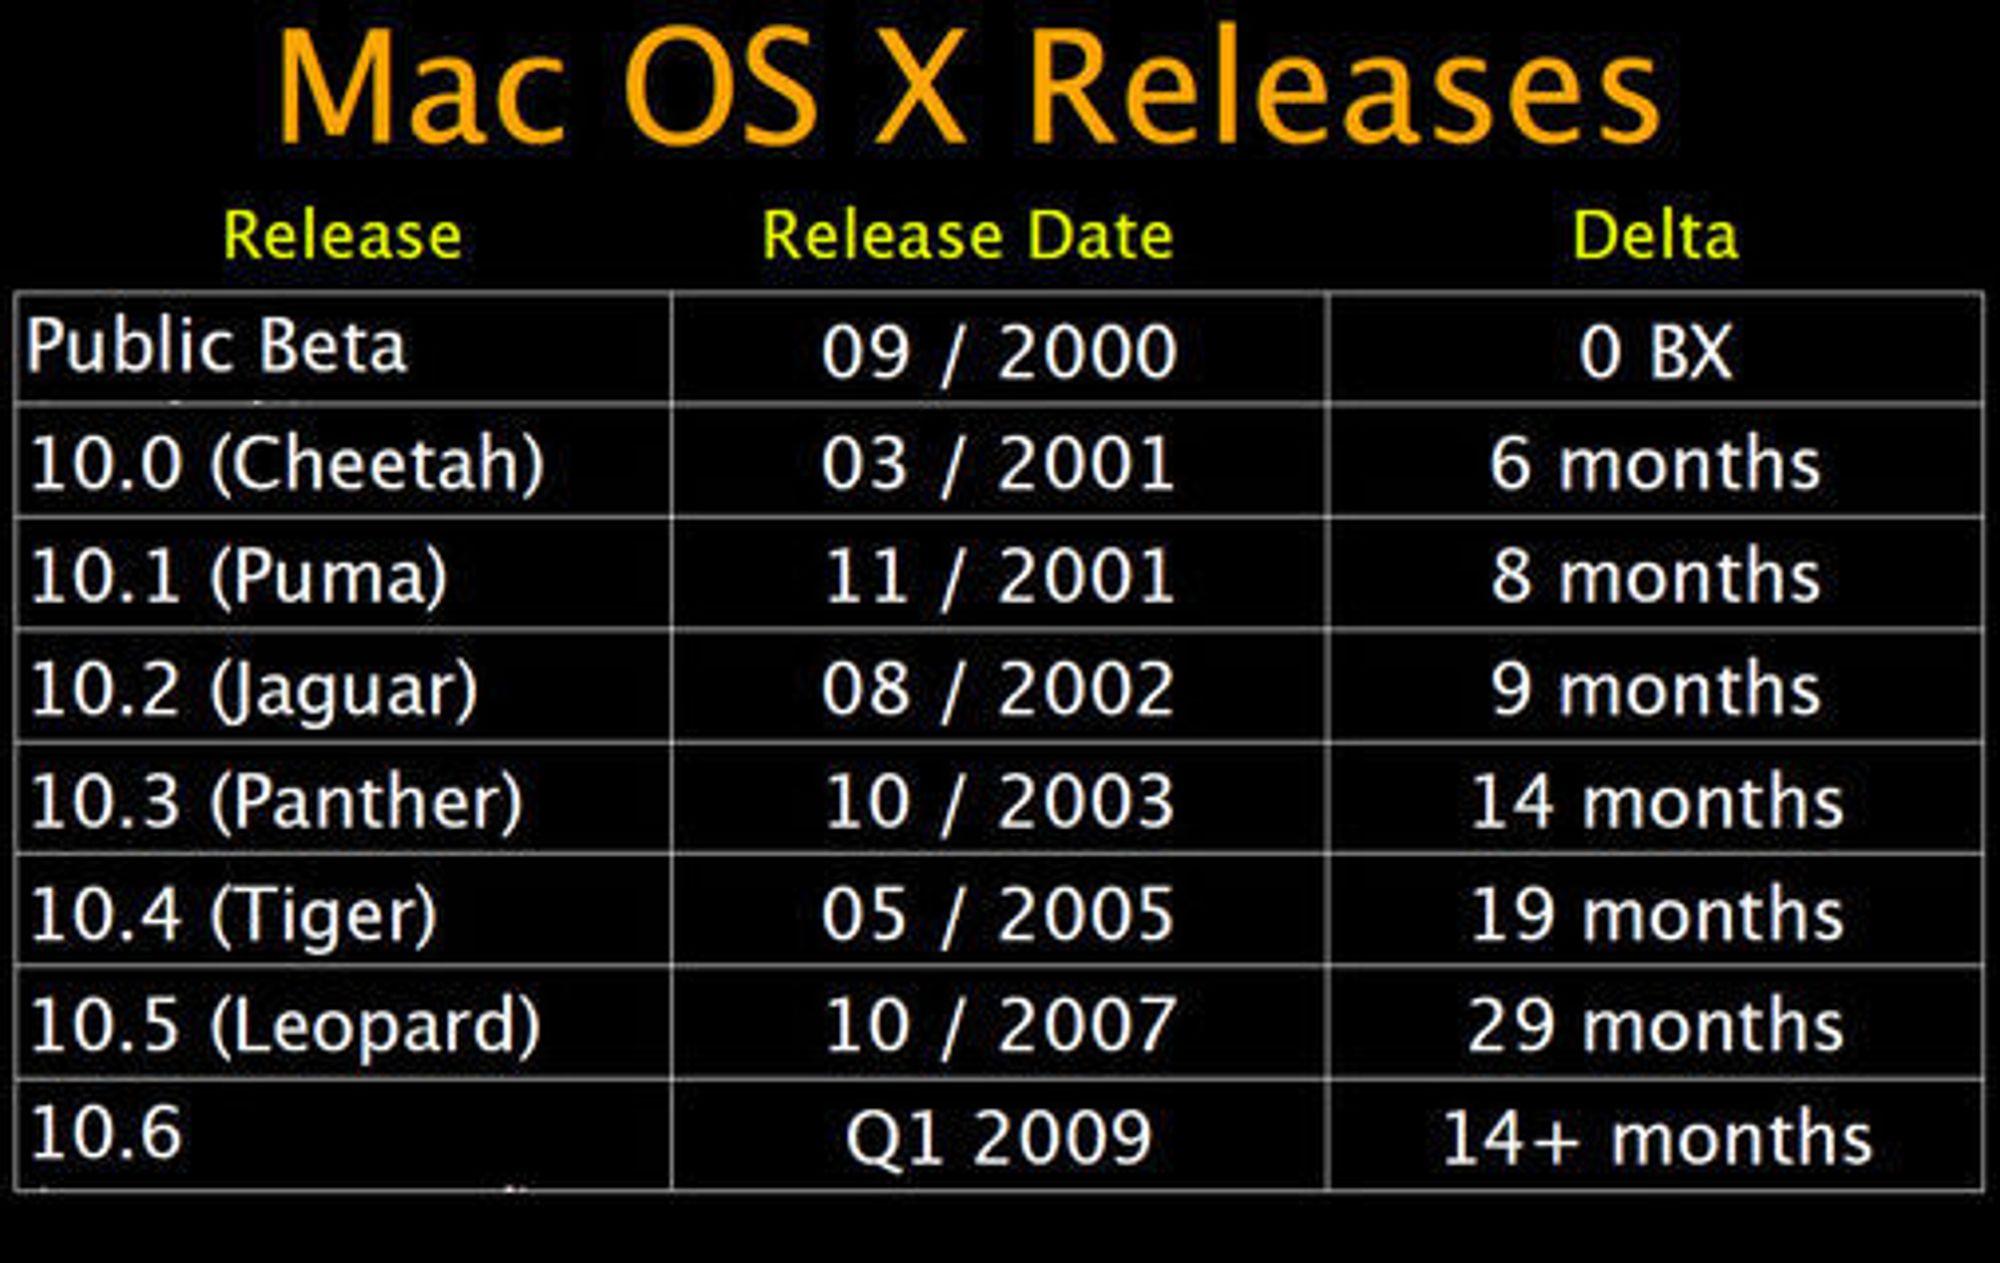 Utgivelsesoversikt for Mac OS X